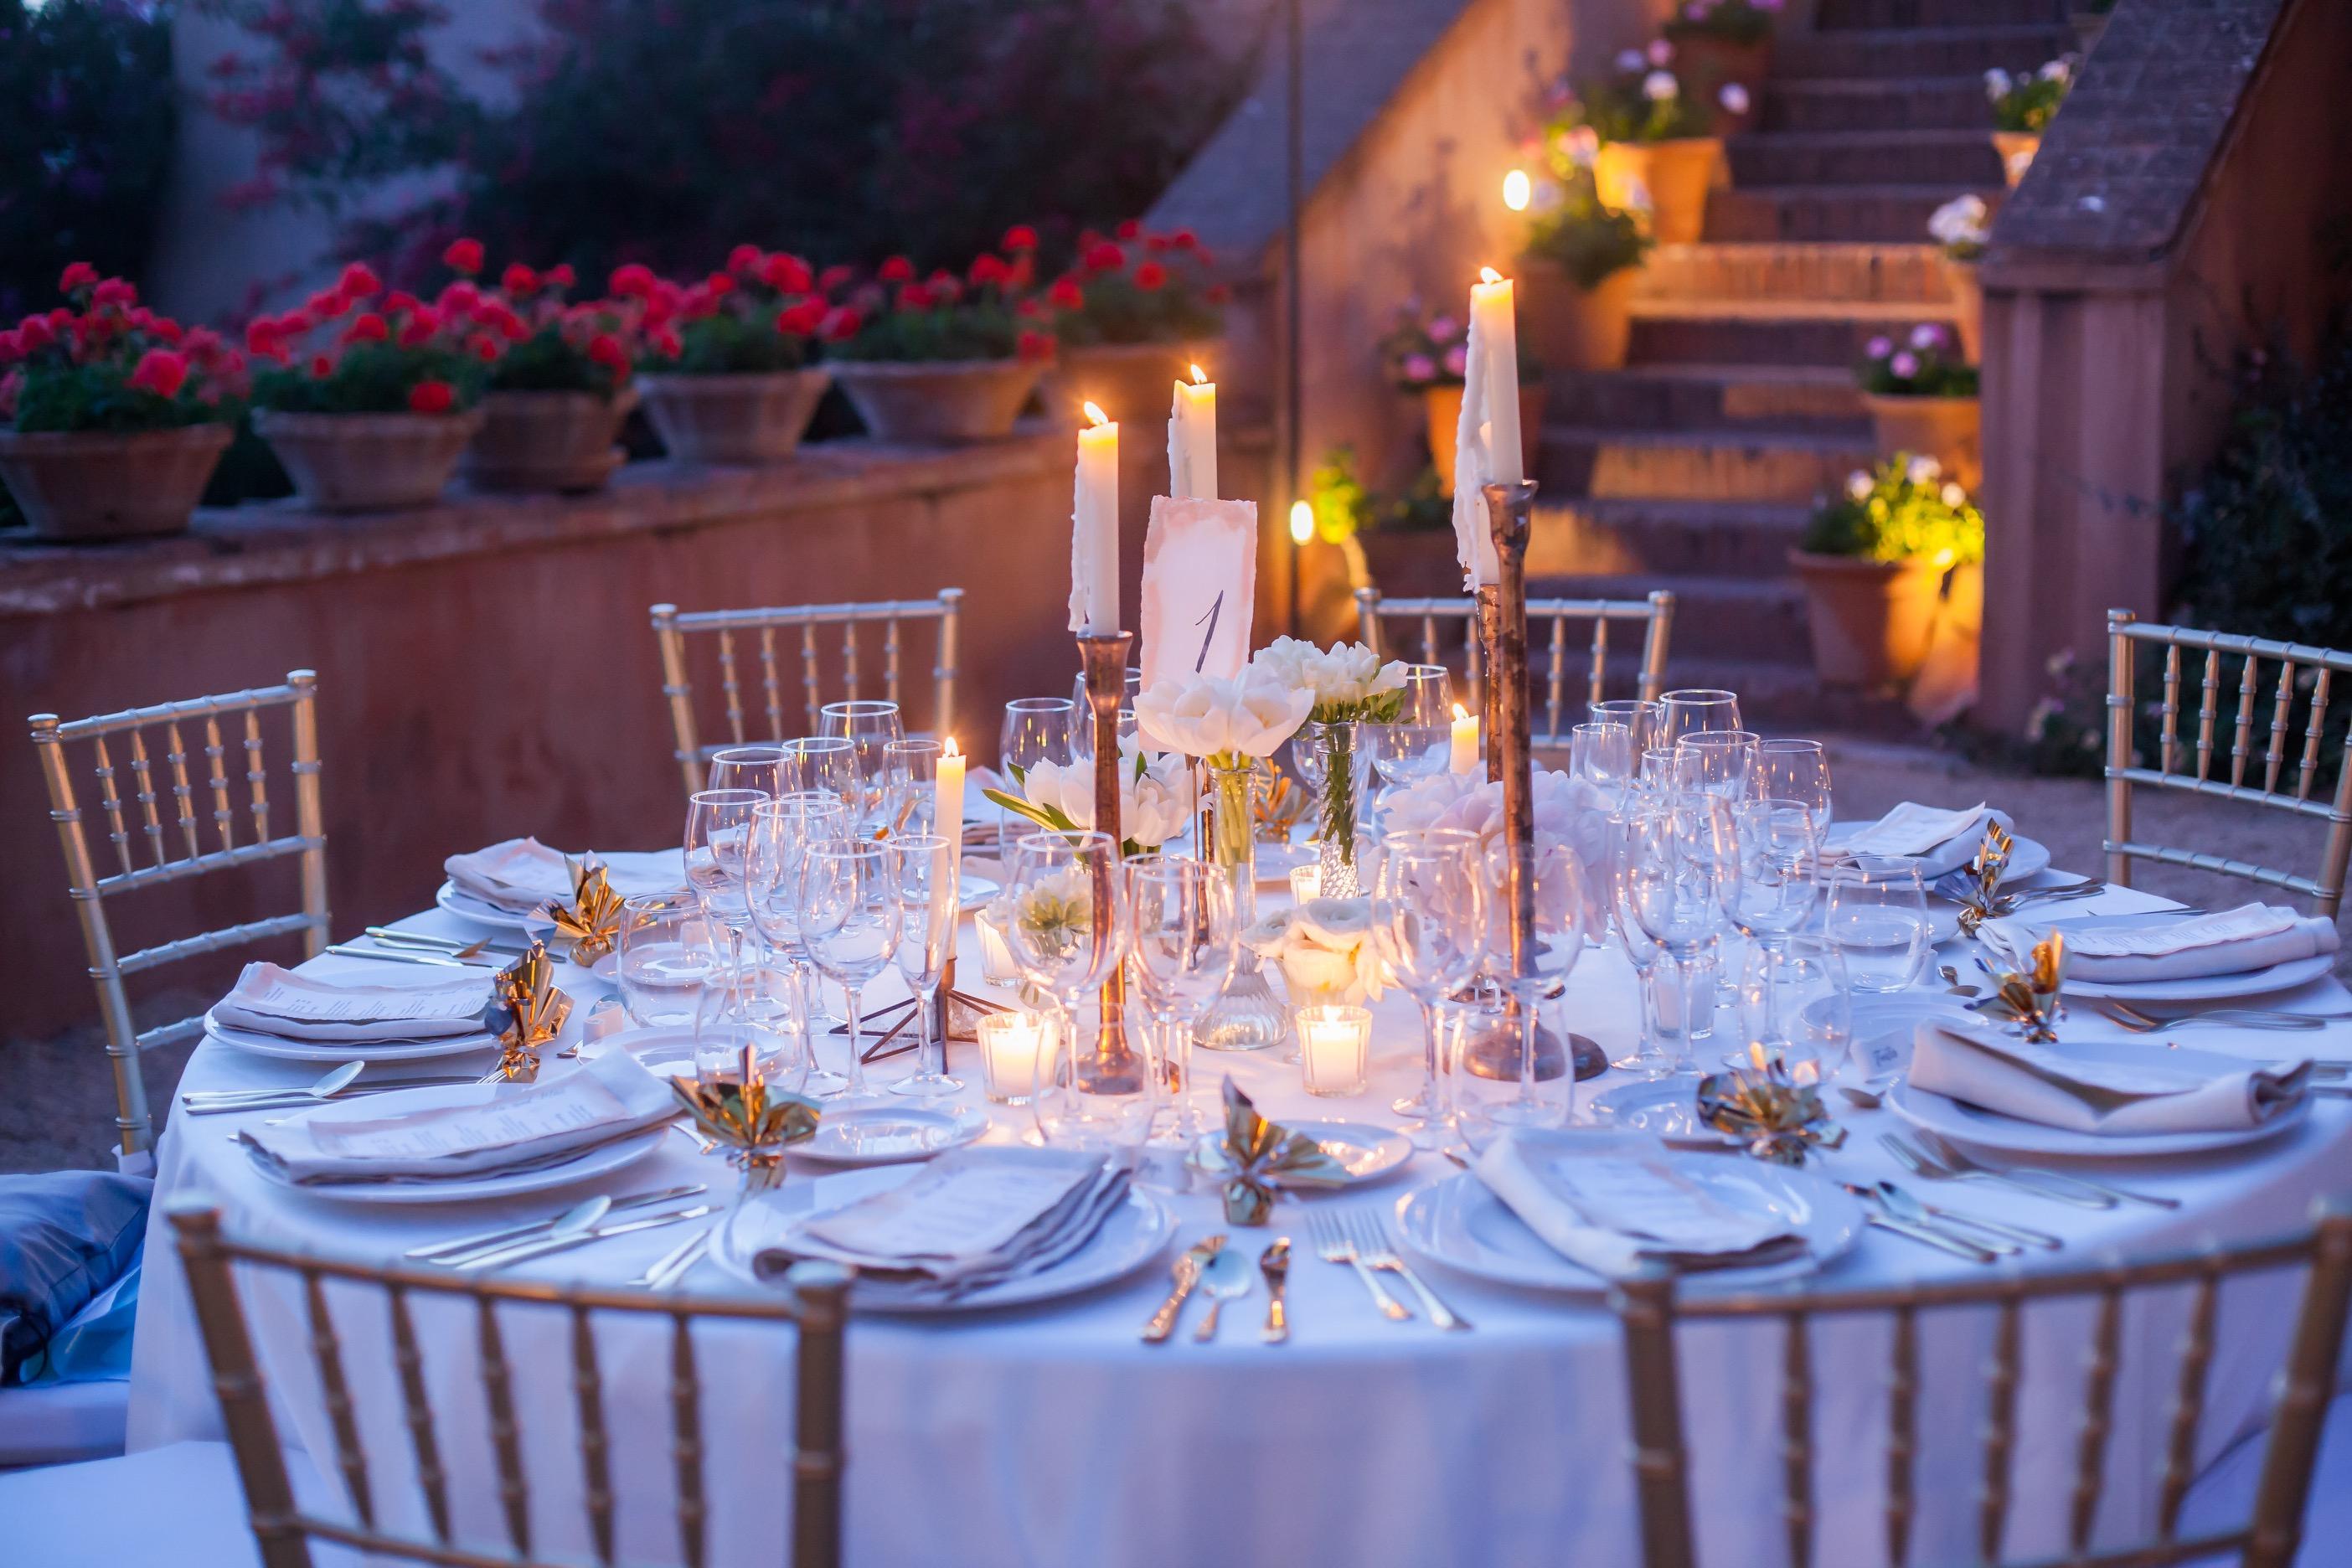 Si-Quiero-Wedding-Planner-By-Sira-Antequera-Bodas-Málaga-Marbella-Miami-6